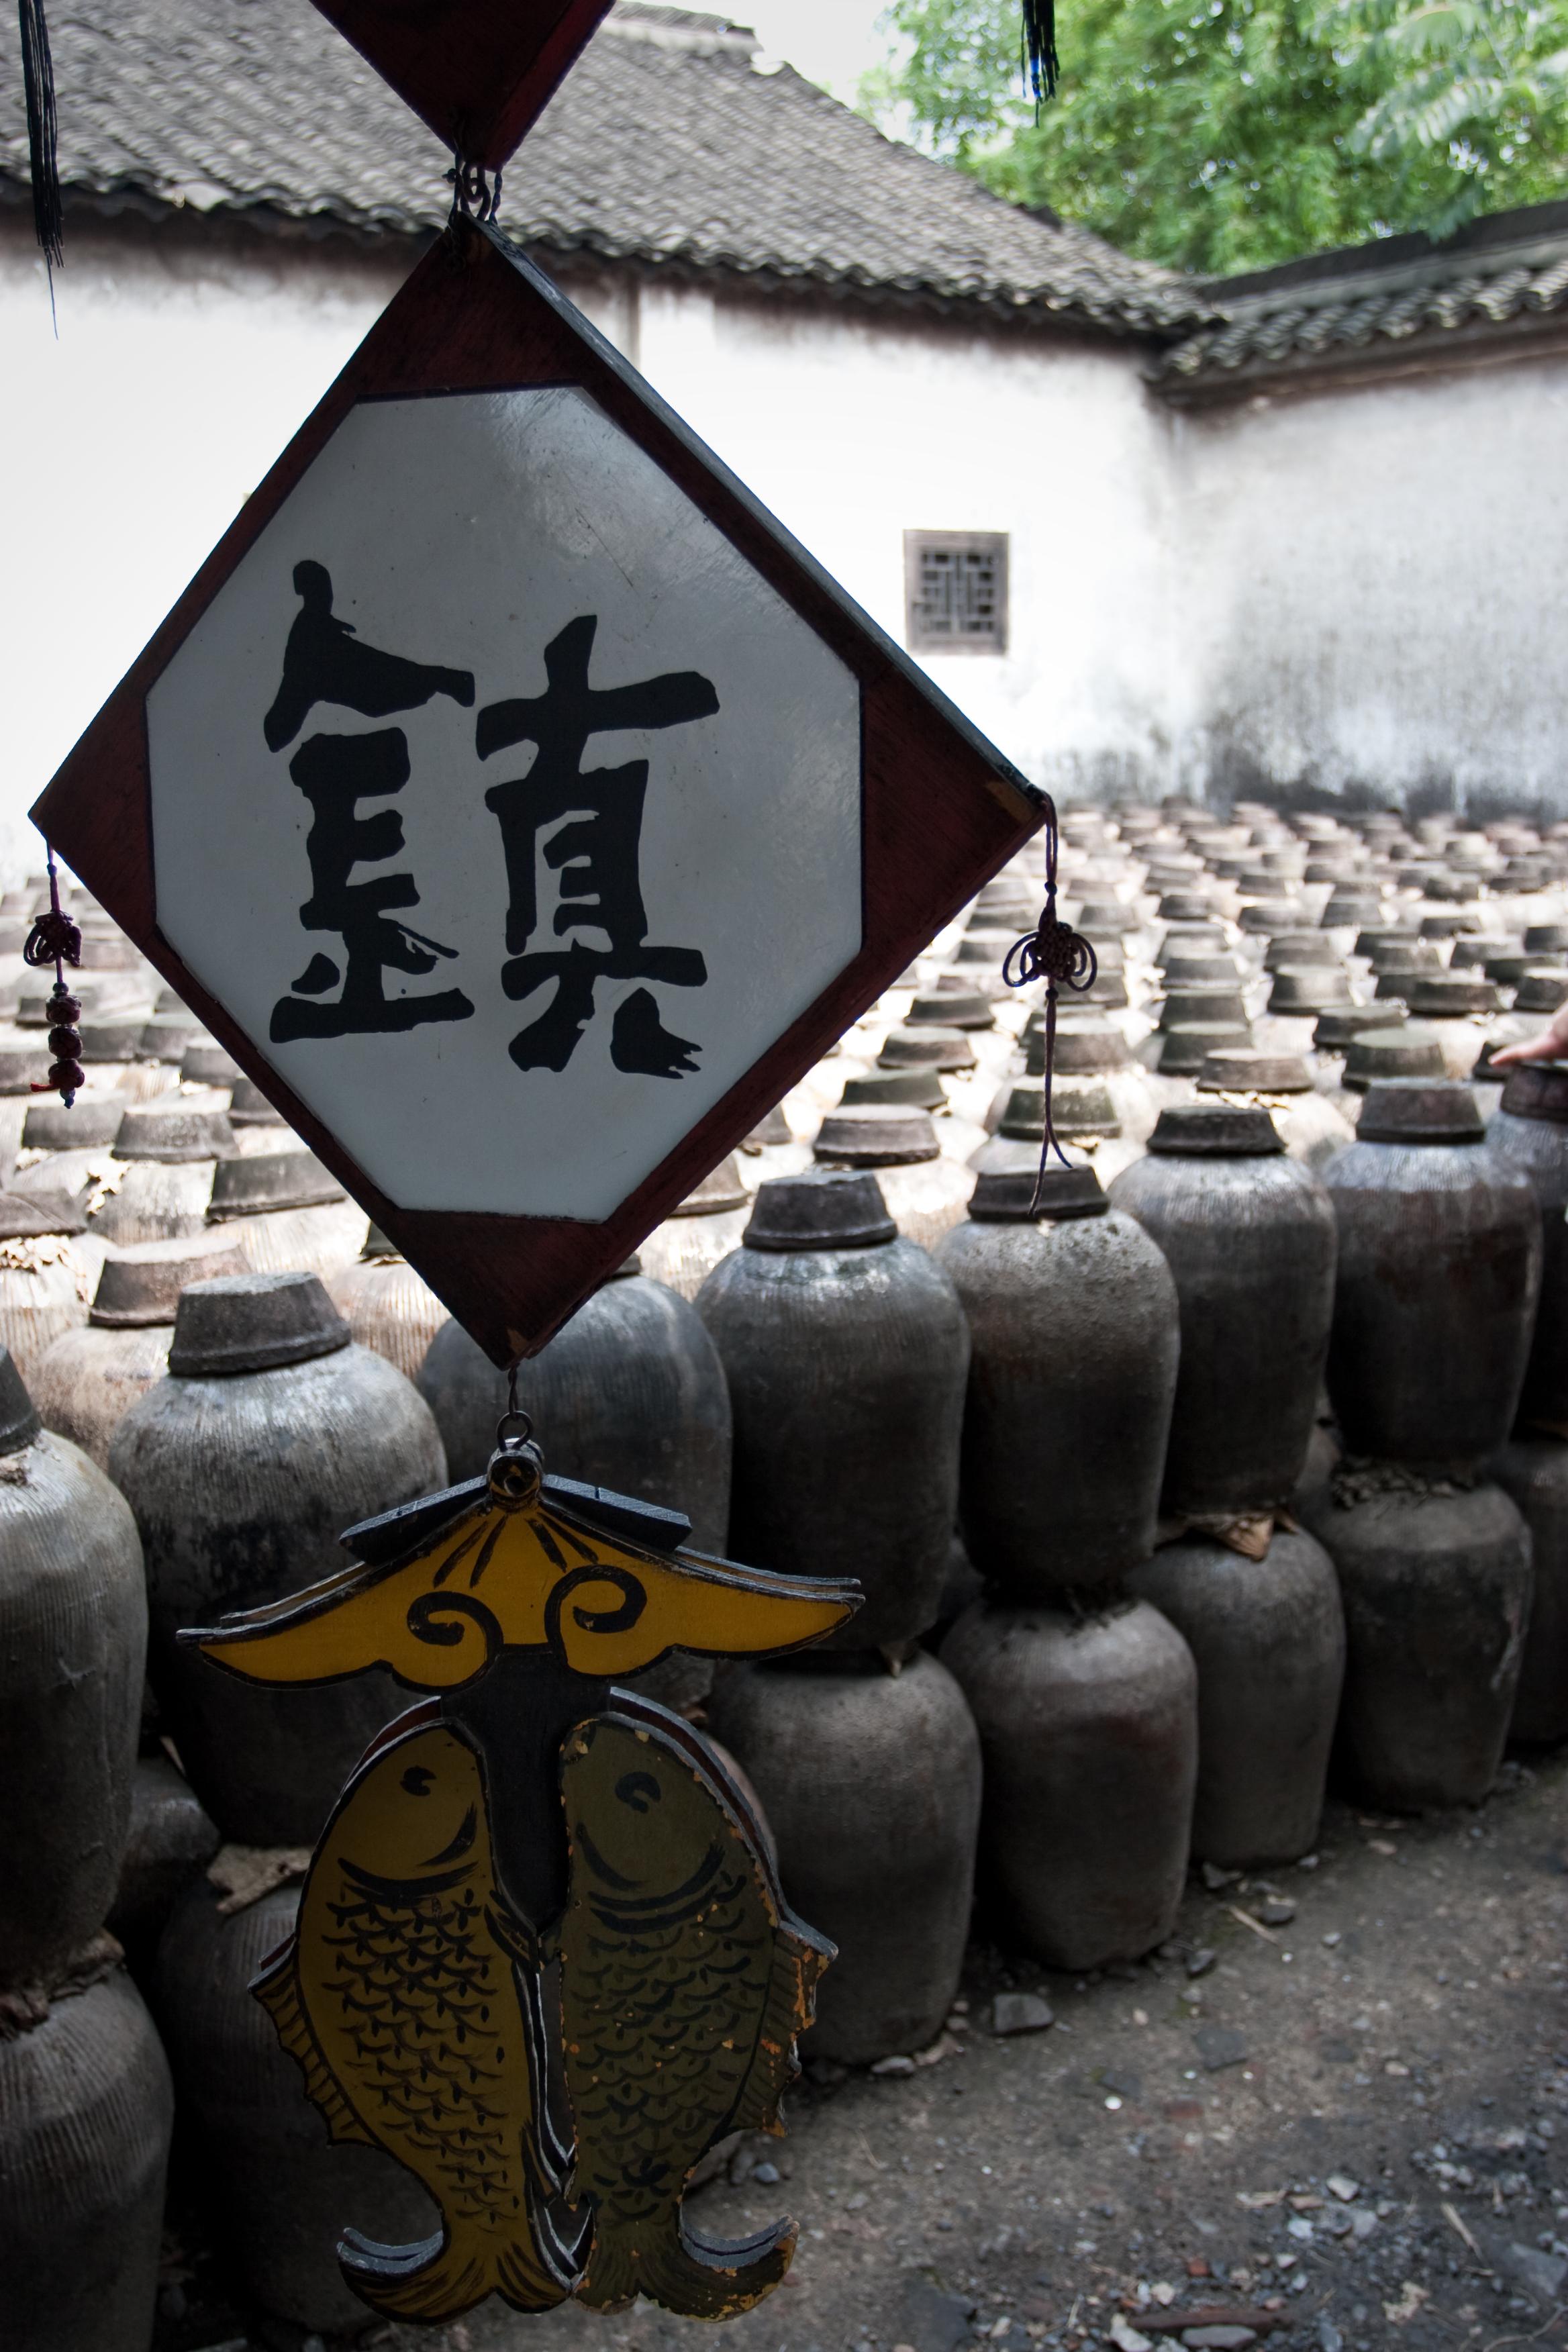 Alcoholic drinks in China - Wikipedia